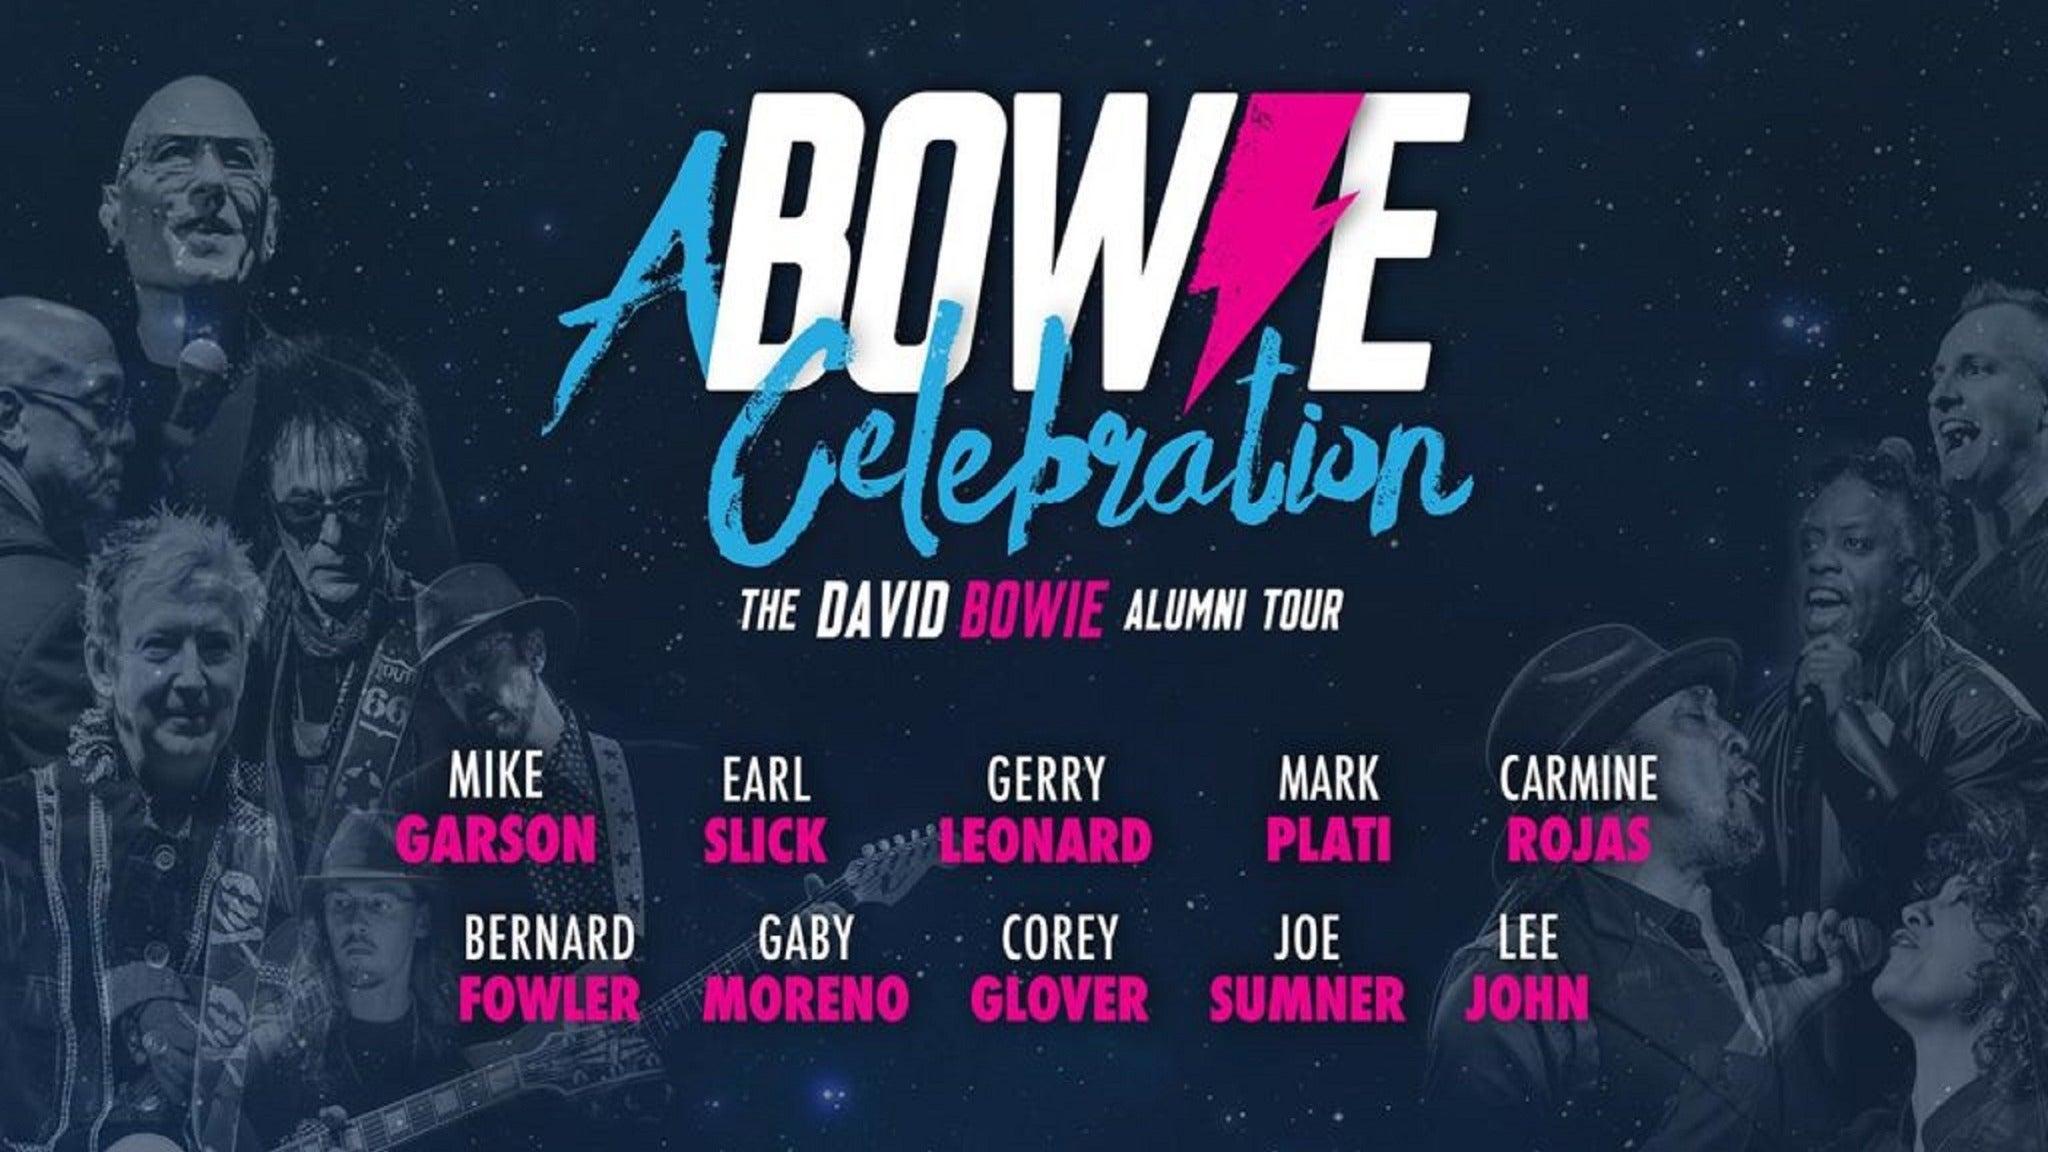 A Bowie Celebration at Keswick Theatre